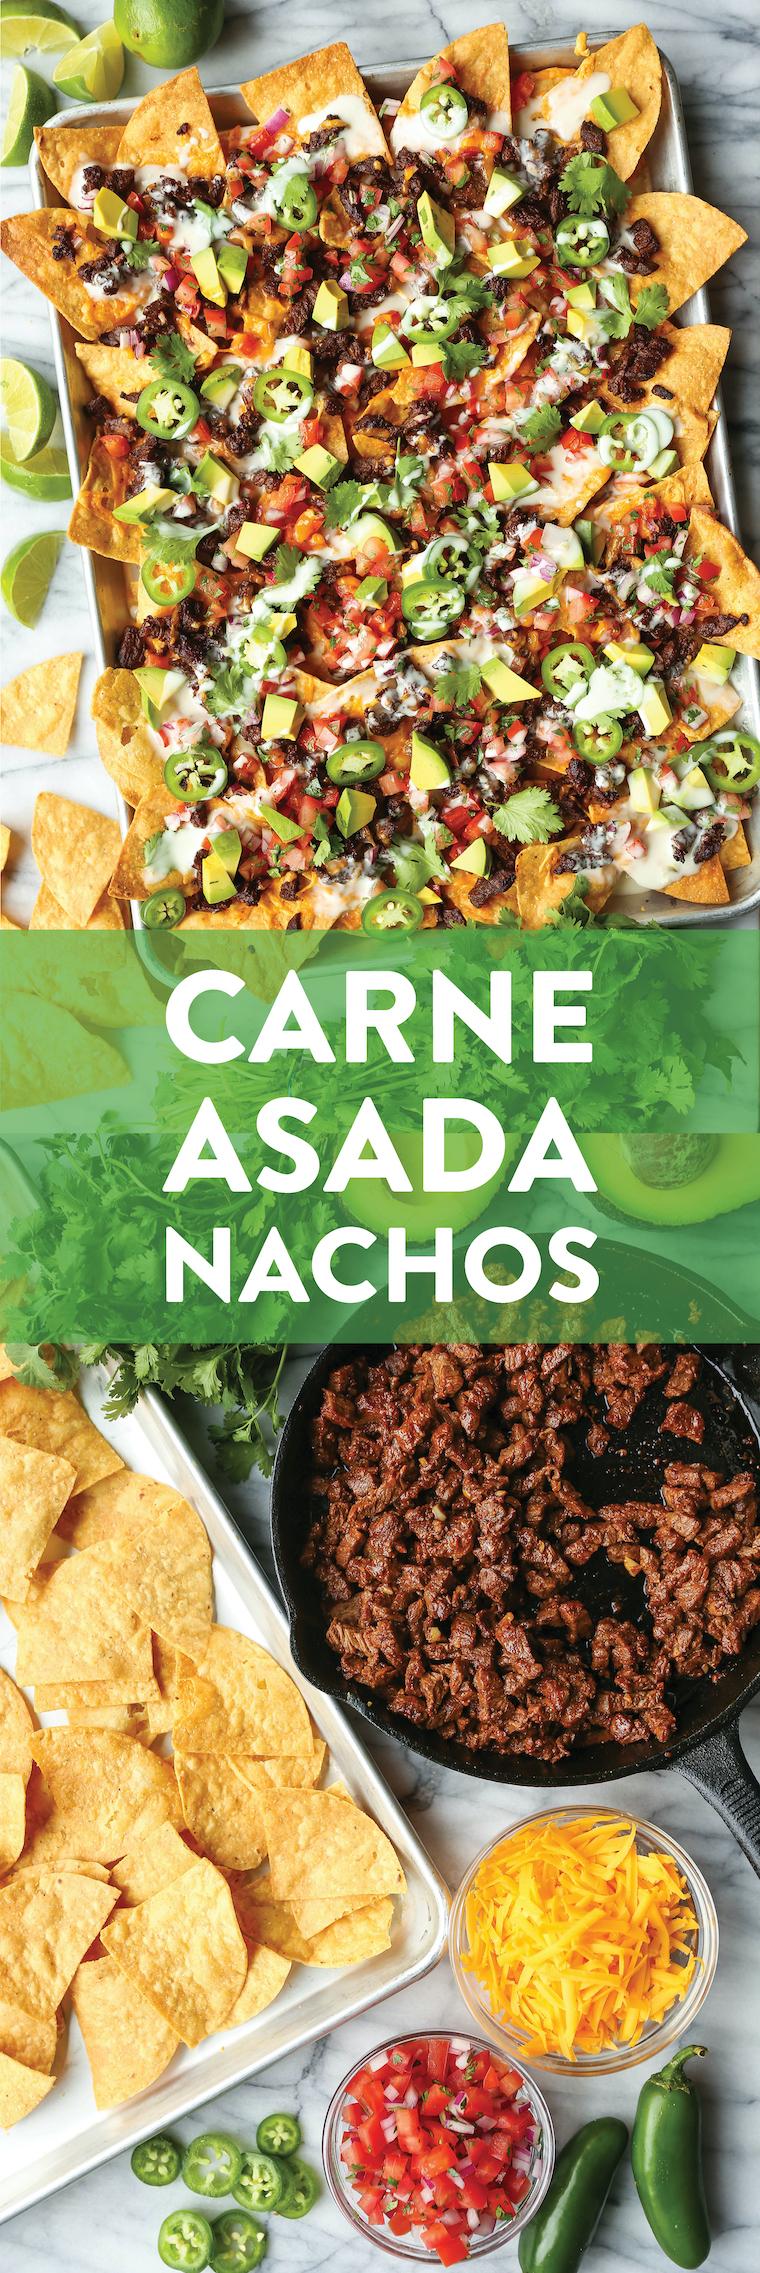 Carne Asada Nachos - BEST NACHOS EVER! Loaded with the easiest, most tender carne asada, sharp cheddar, pico de gallo, avocado, jalapeno + drizzle of queso!